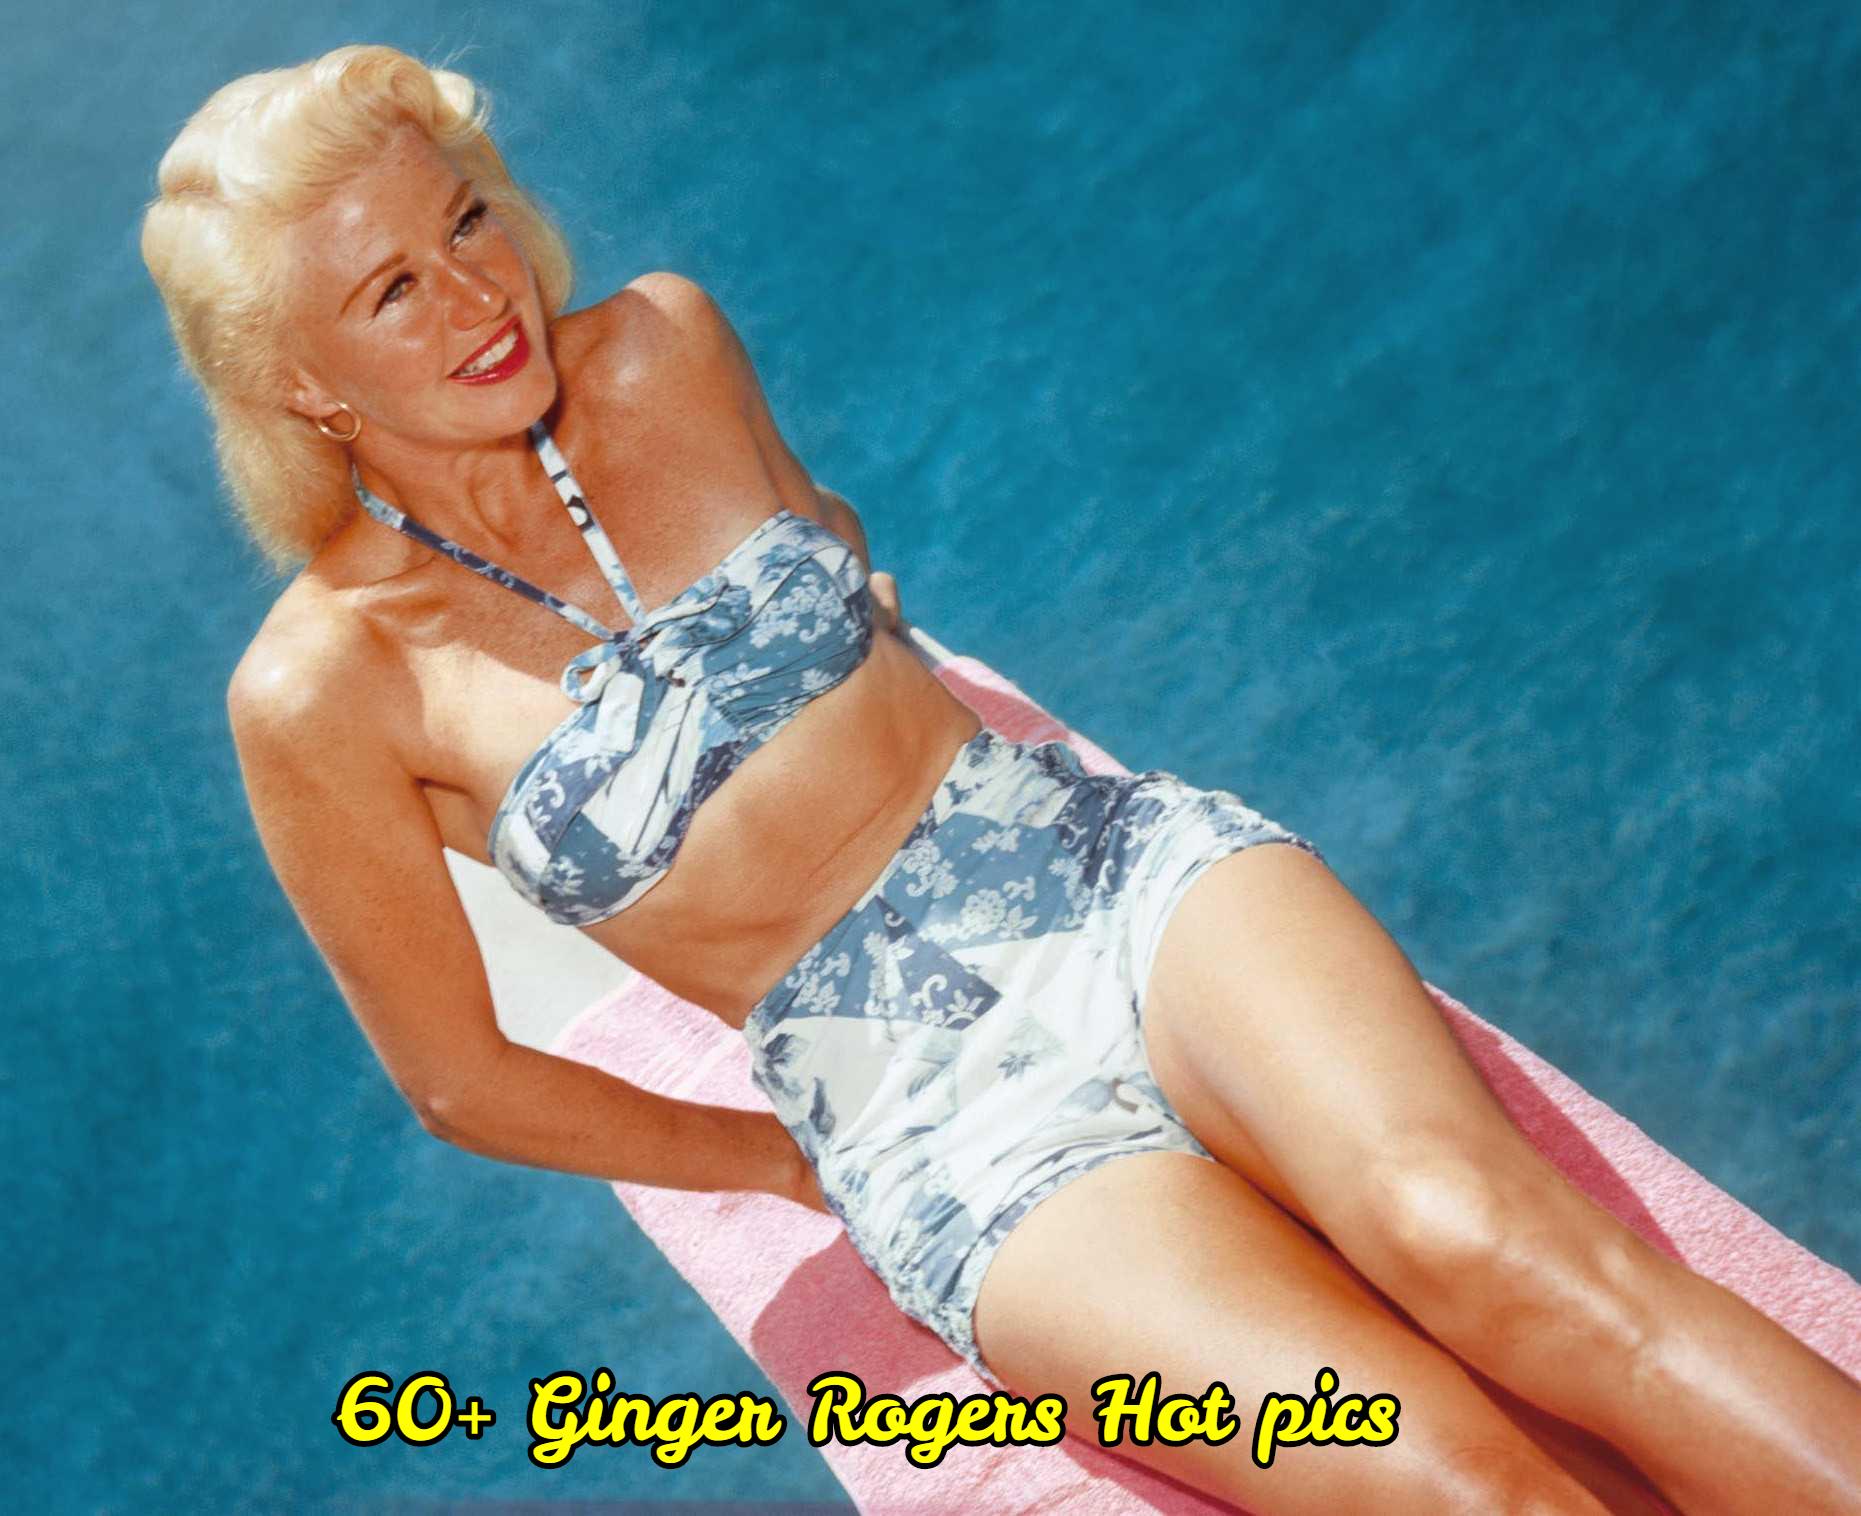 Ginger Rogers hot pics